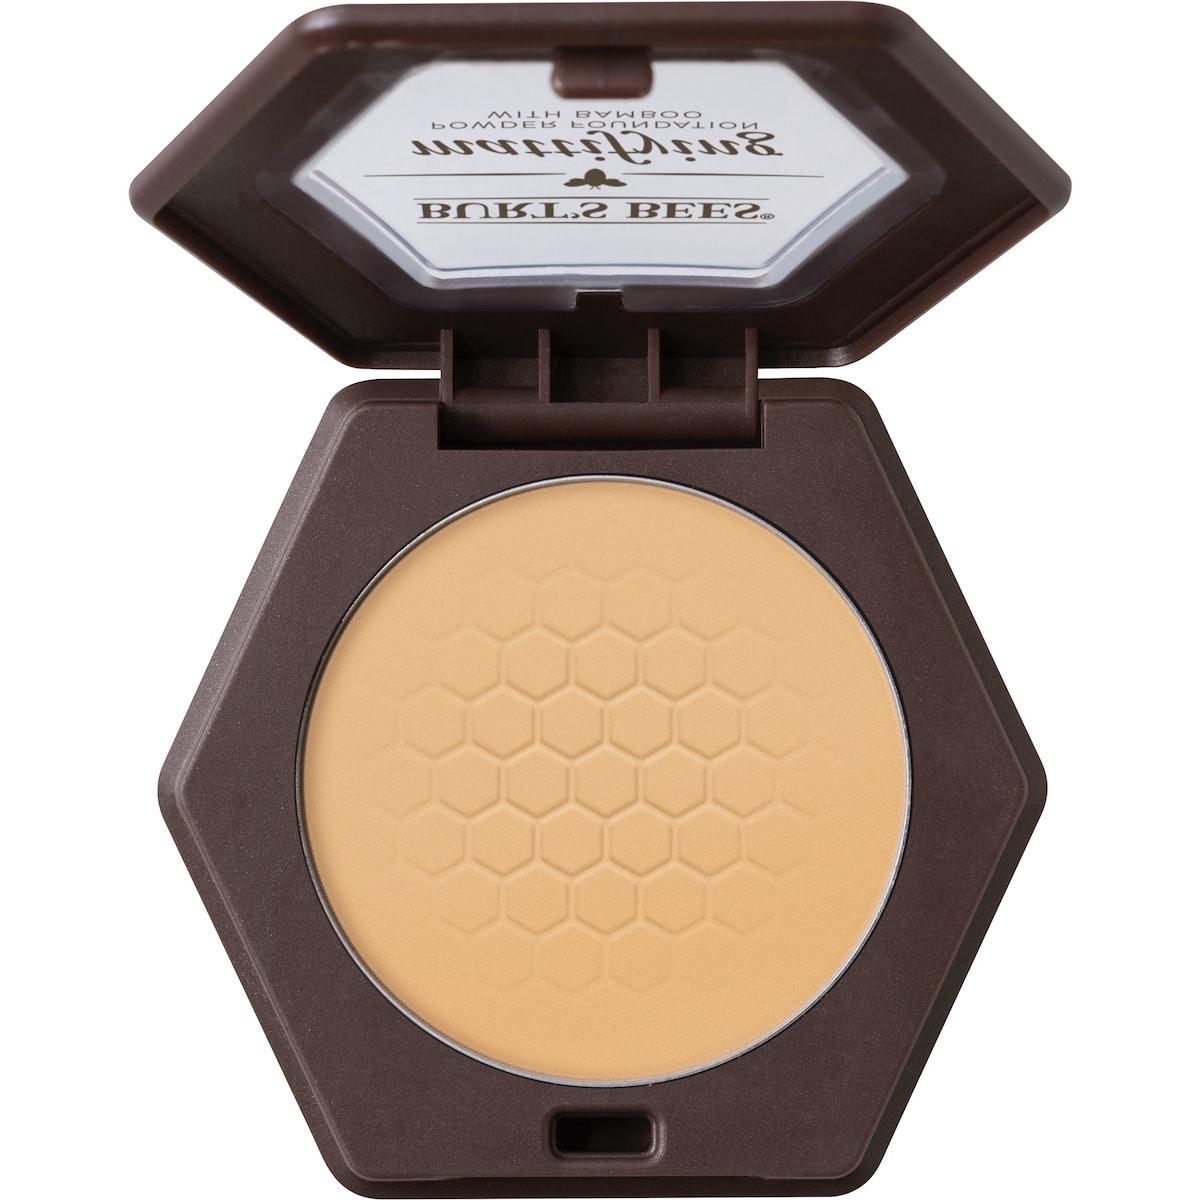 Burt's Bees 100% Natural Mattifying Powder Foundation